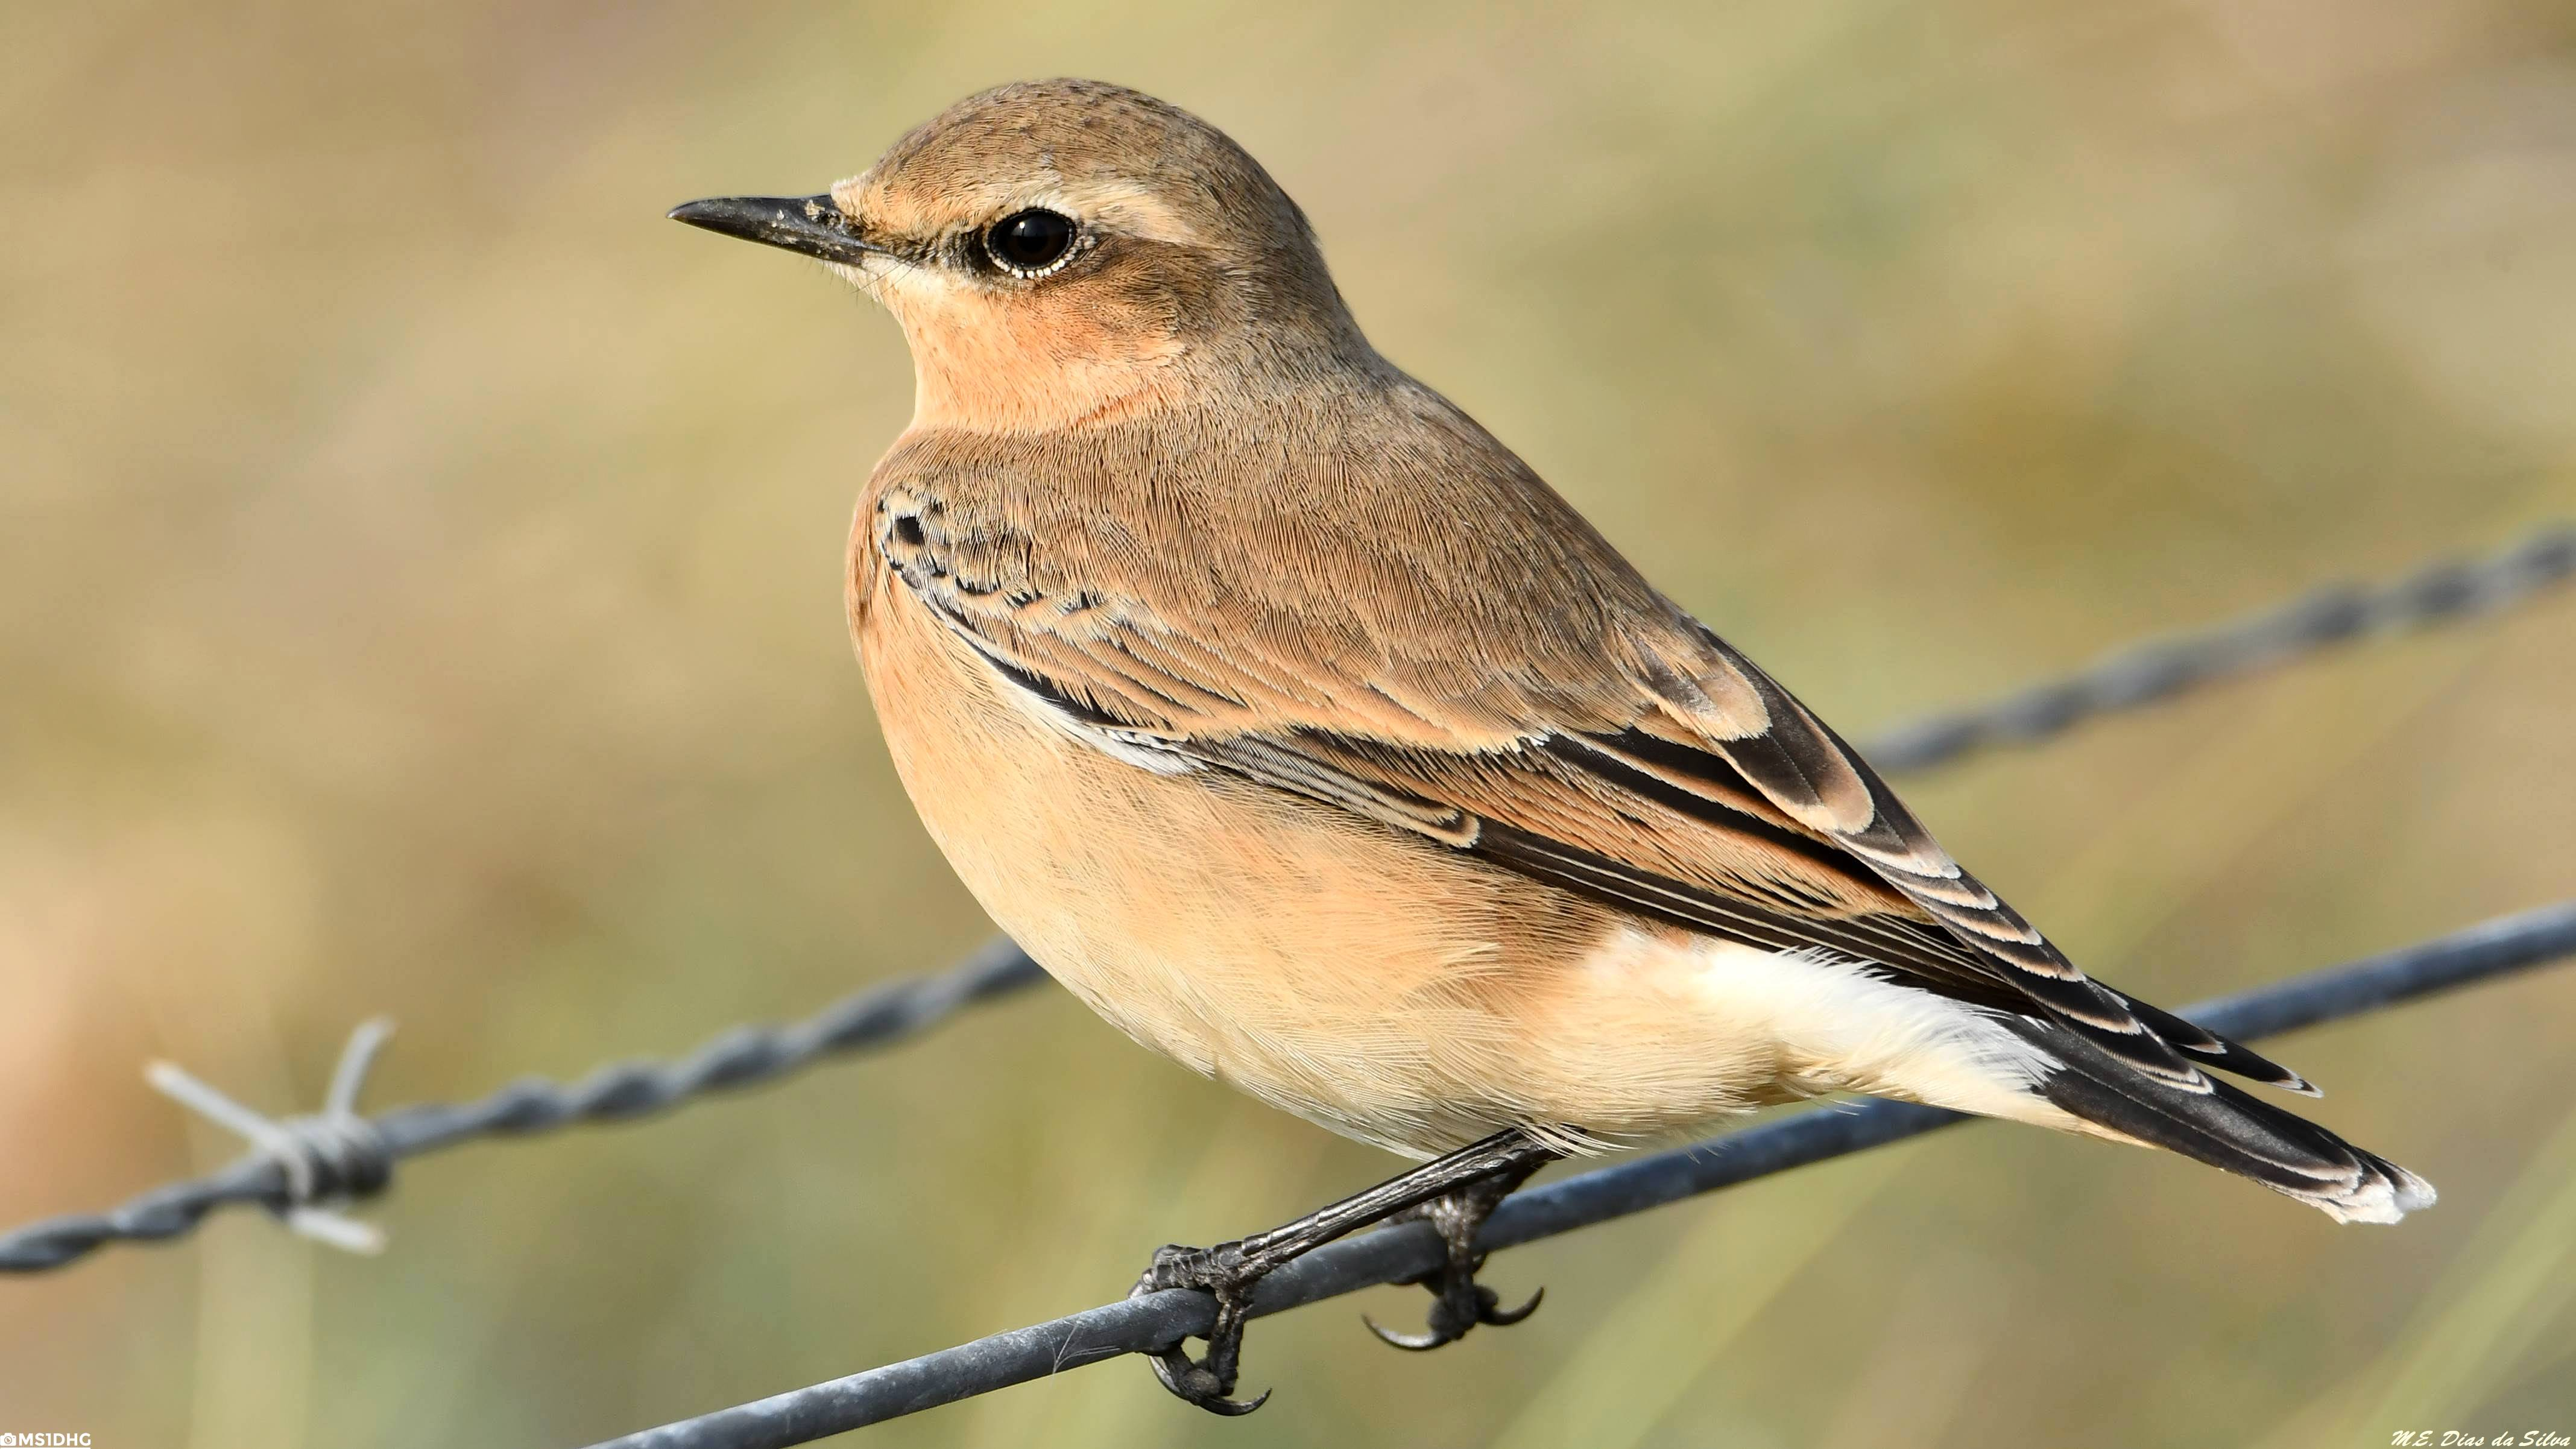 Fórum Aves - Birdwatching em Portugal - Portal Chasco-cinzento%20(35)